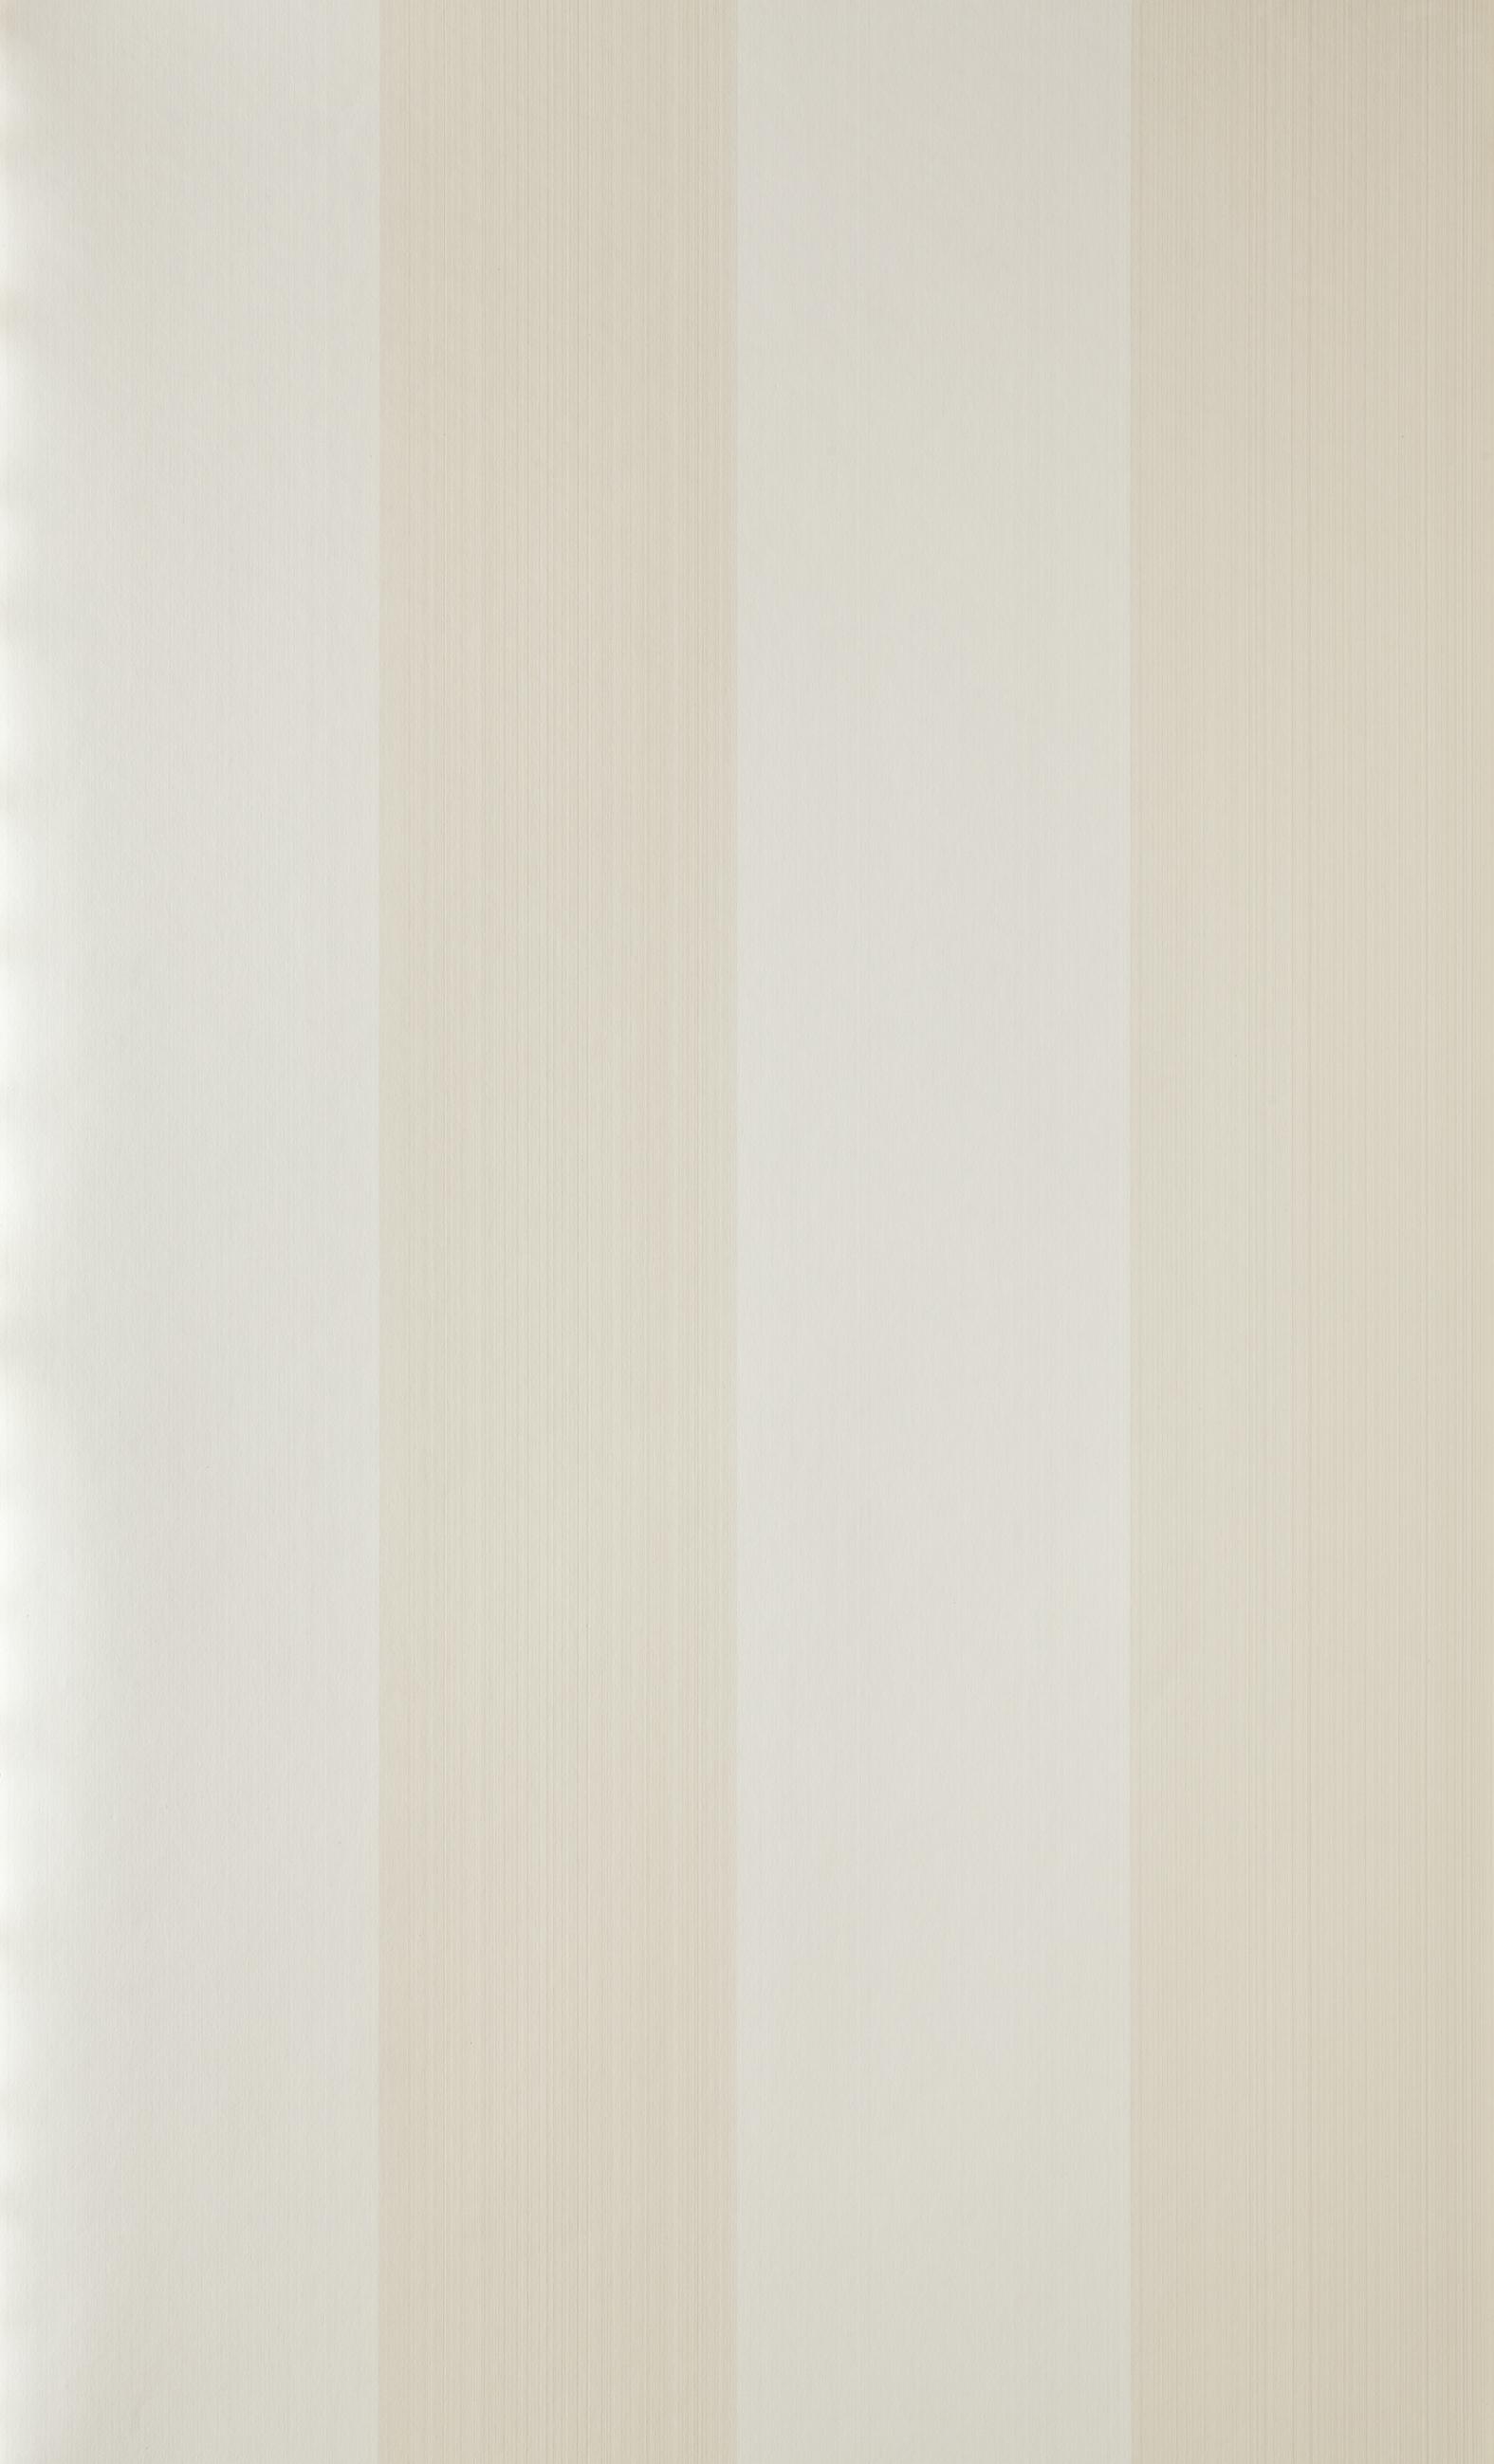 Broad Stripe 1307 $195 Per Roll  Order Now